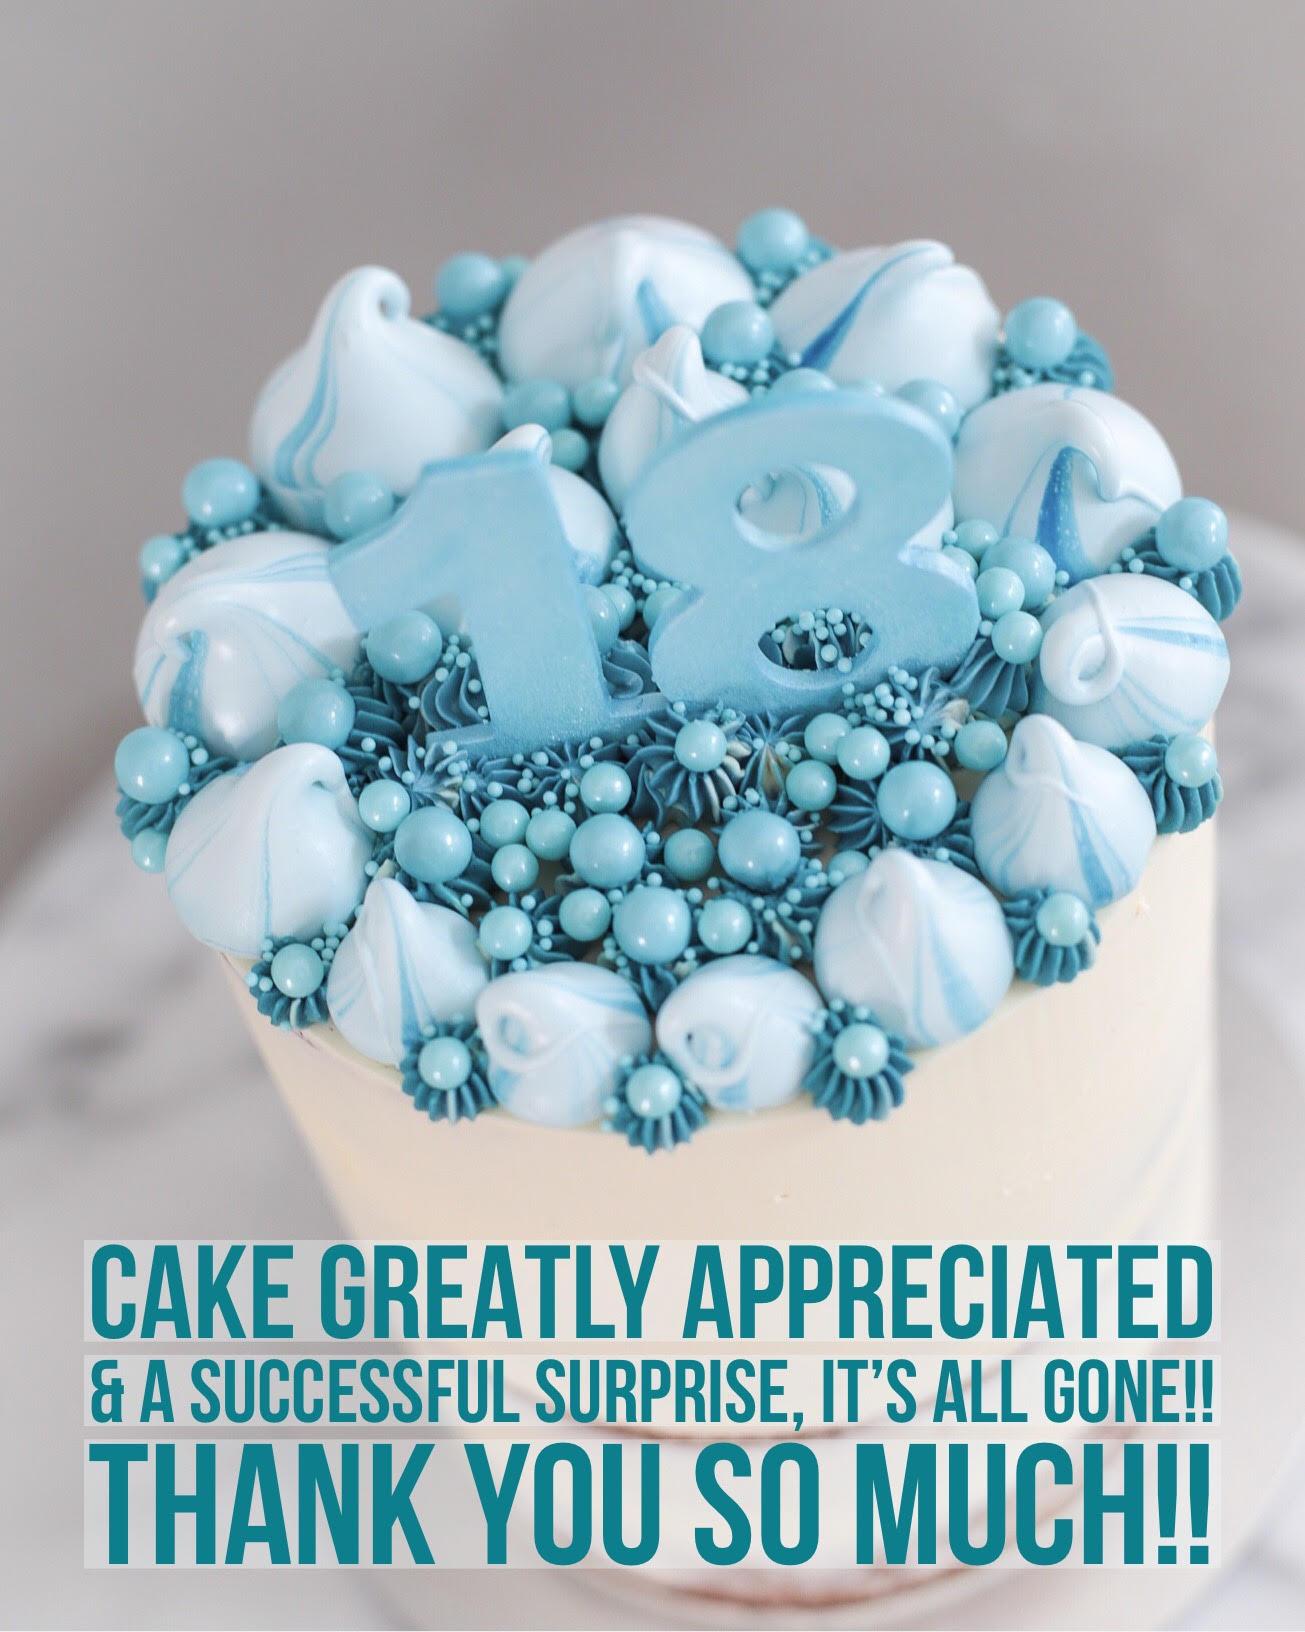 Sydney Cakes, Baked By Fiona blue meringue cake